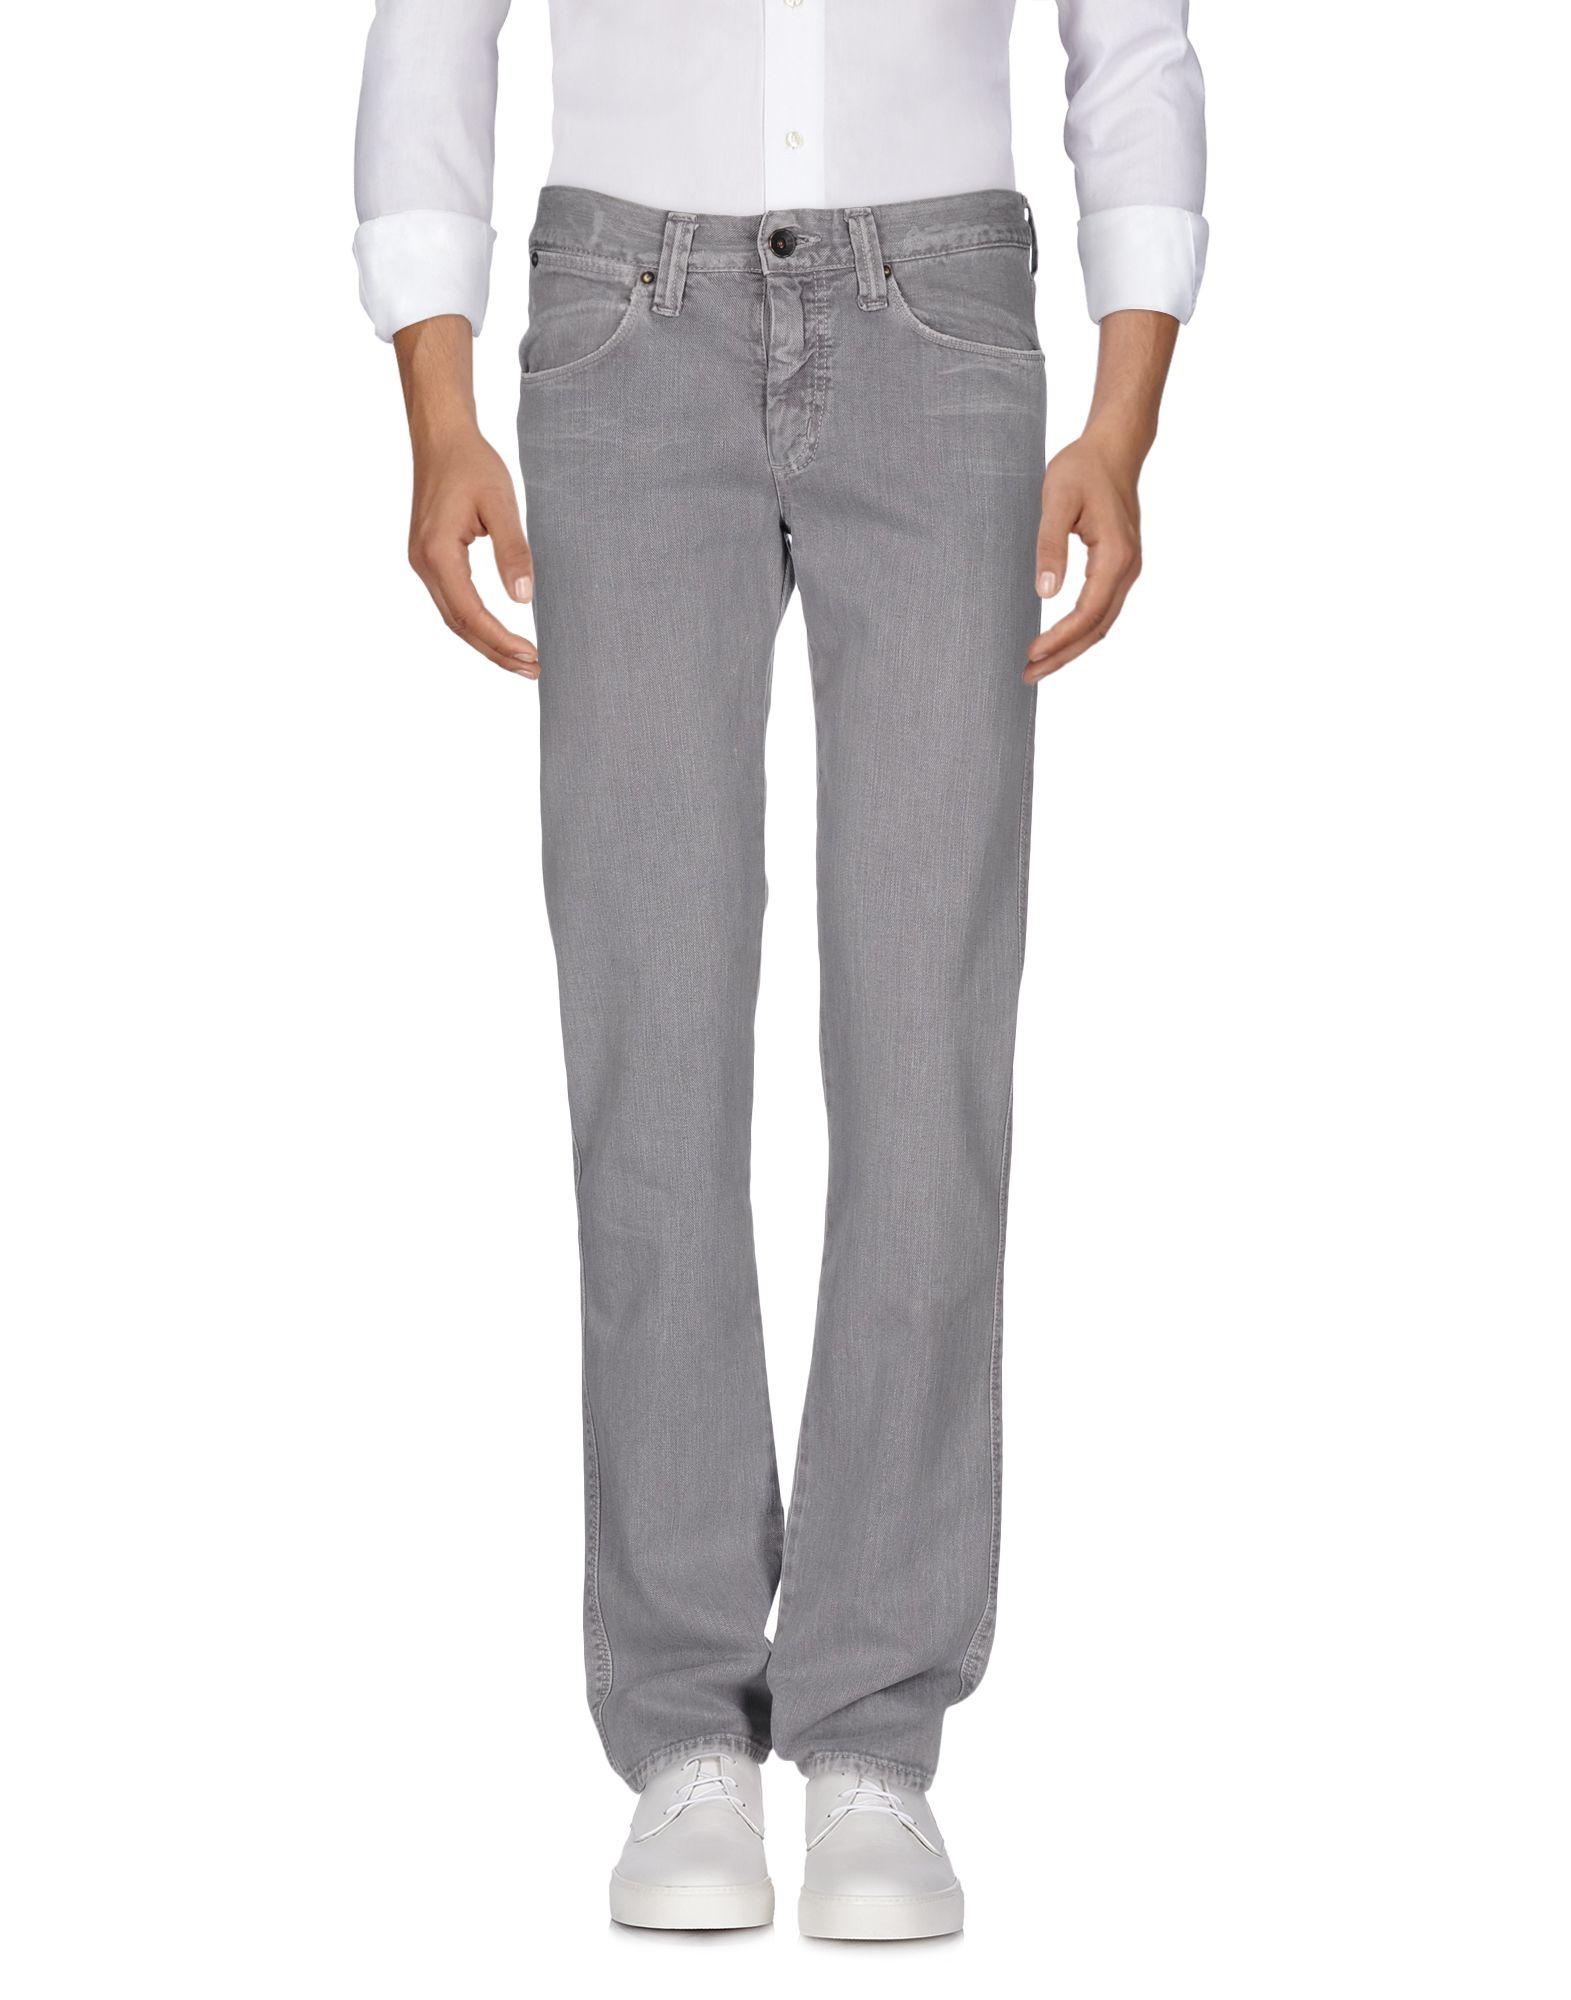 SEAL KAY INDEPENDENT Джинсовые брюки dismero джинсовые брюки